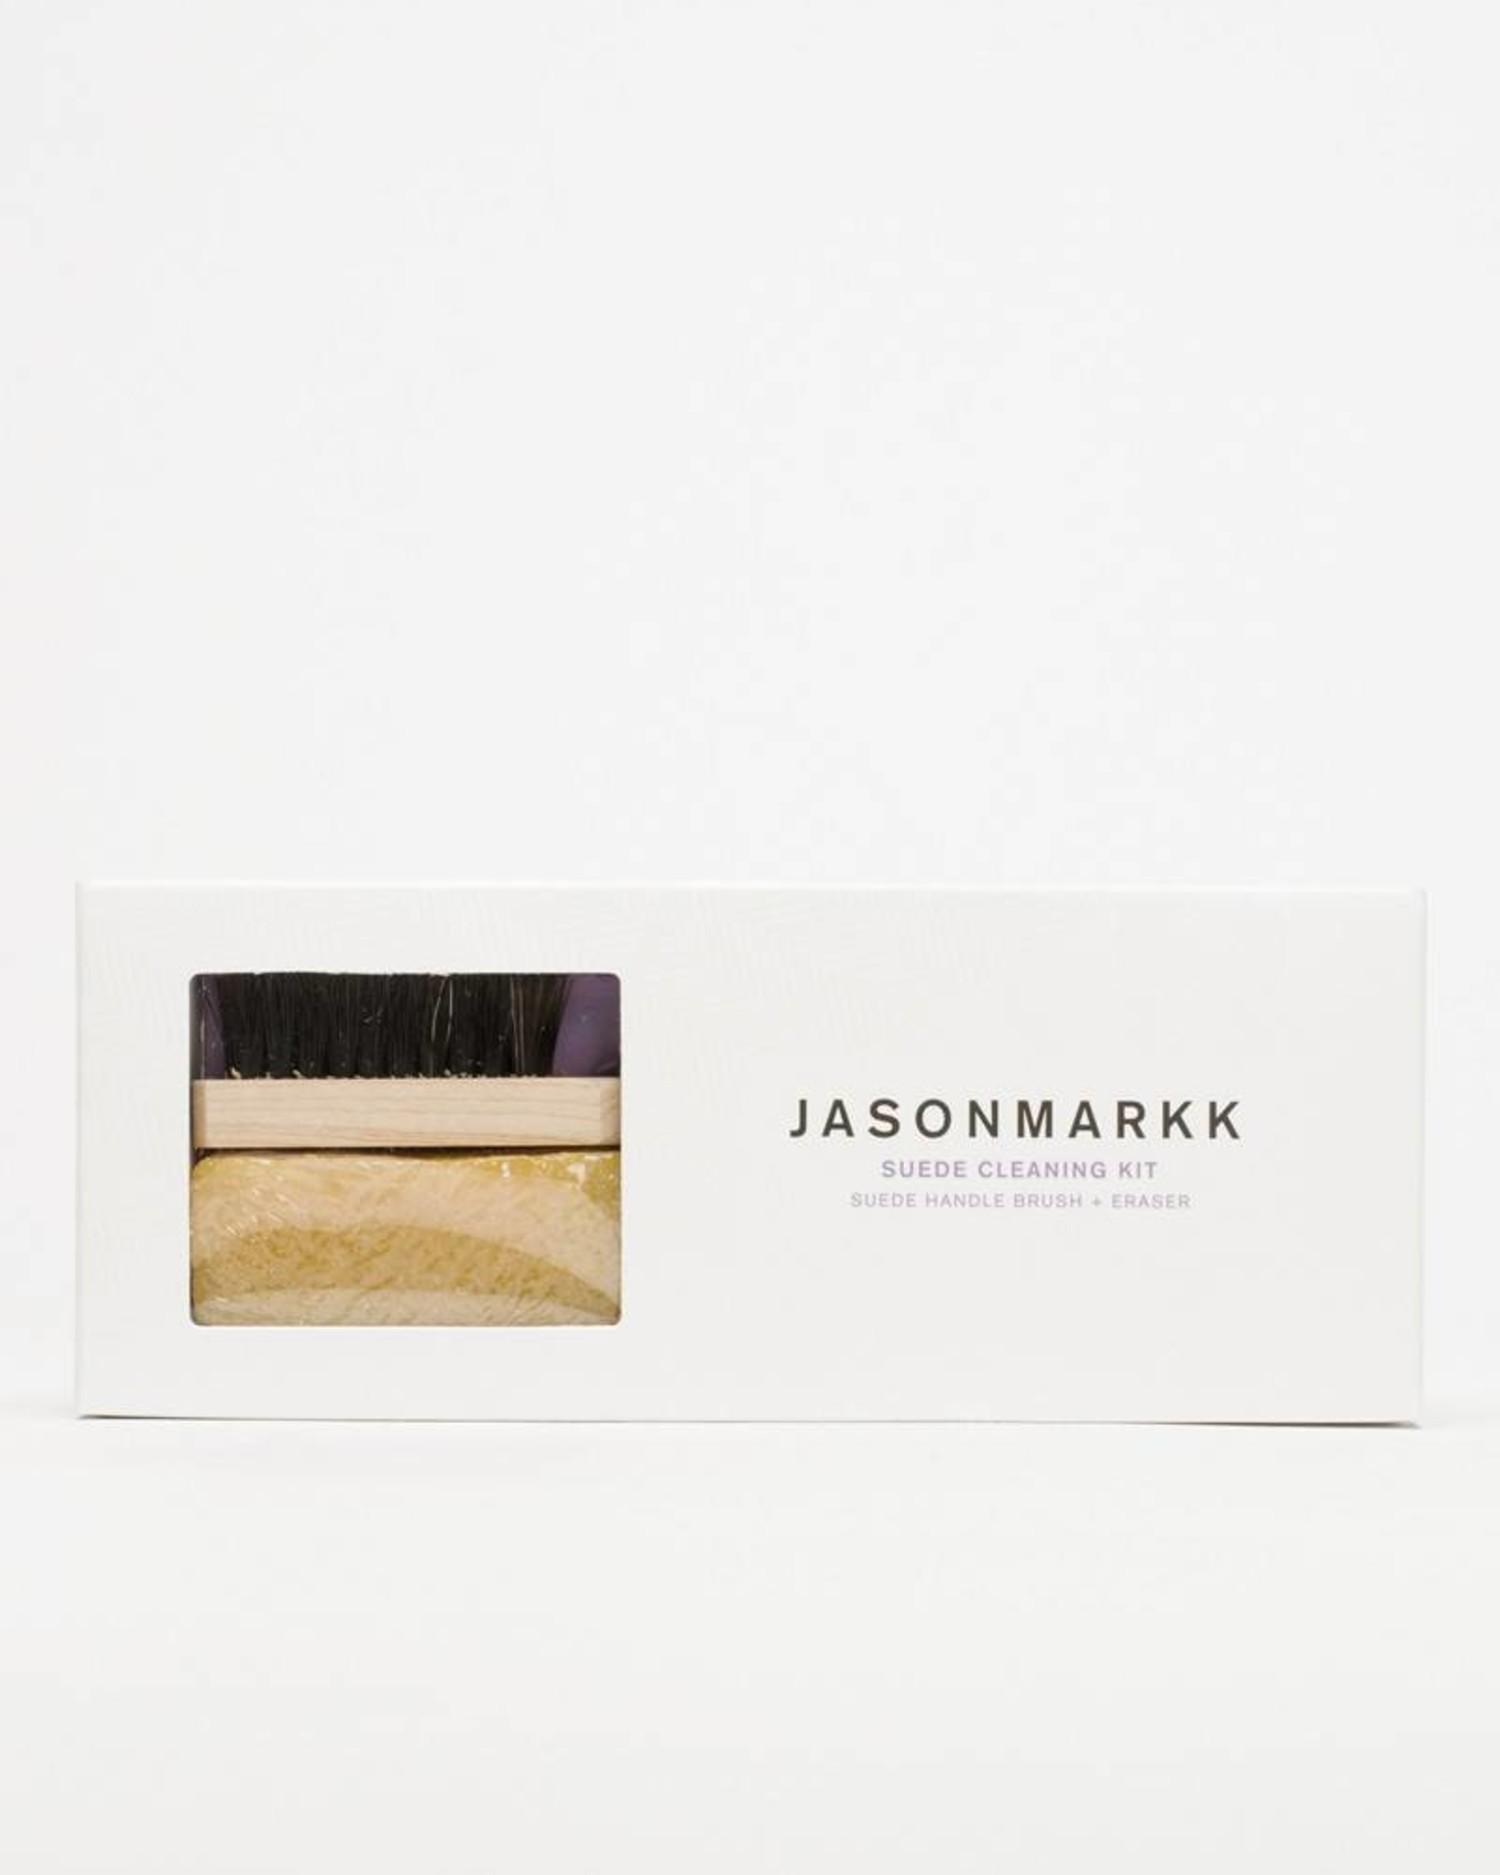 Jason Markk Suede Schoonmaakset